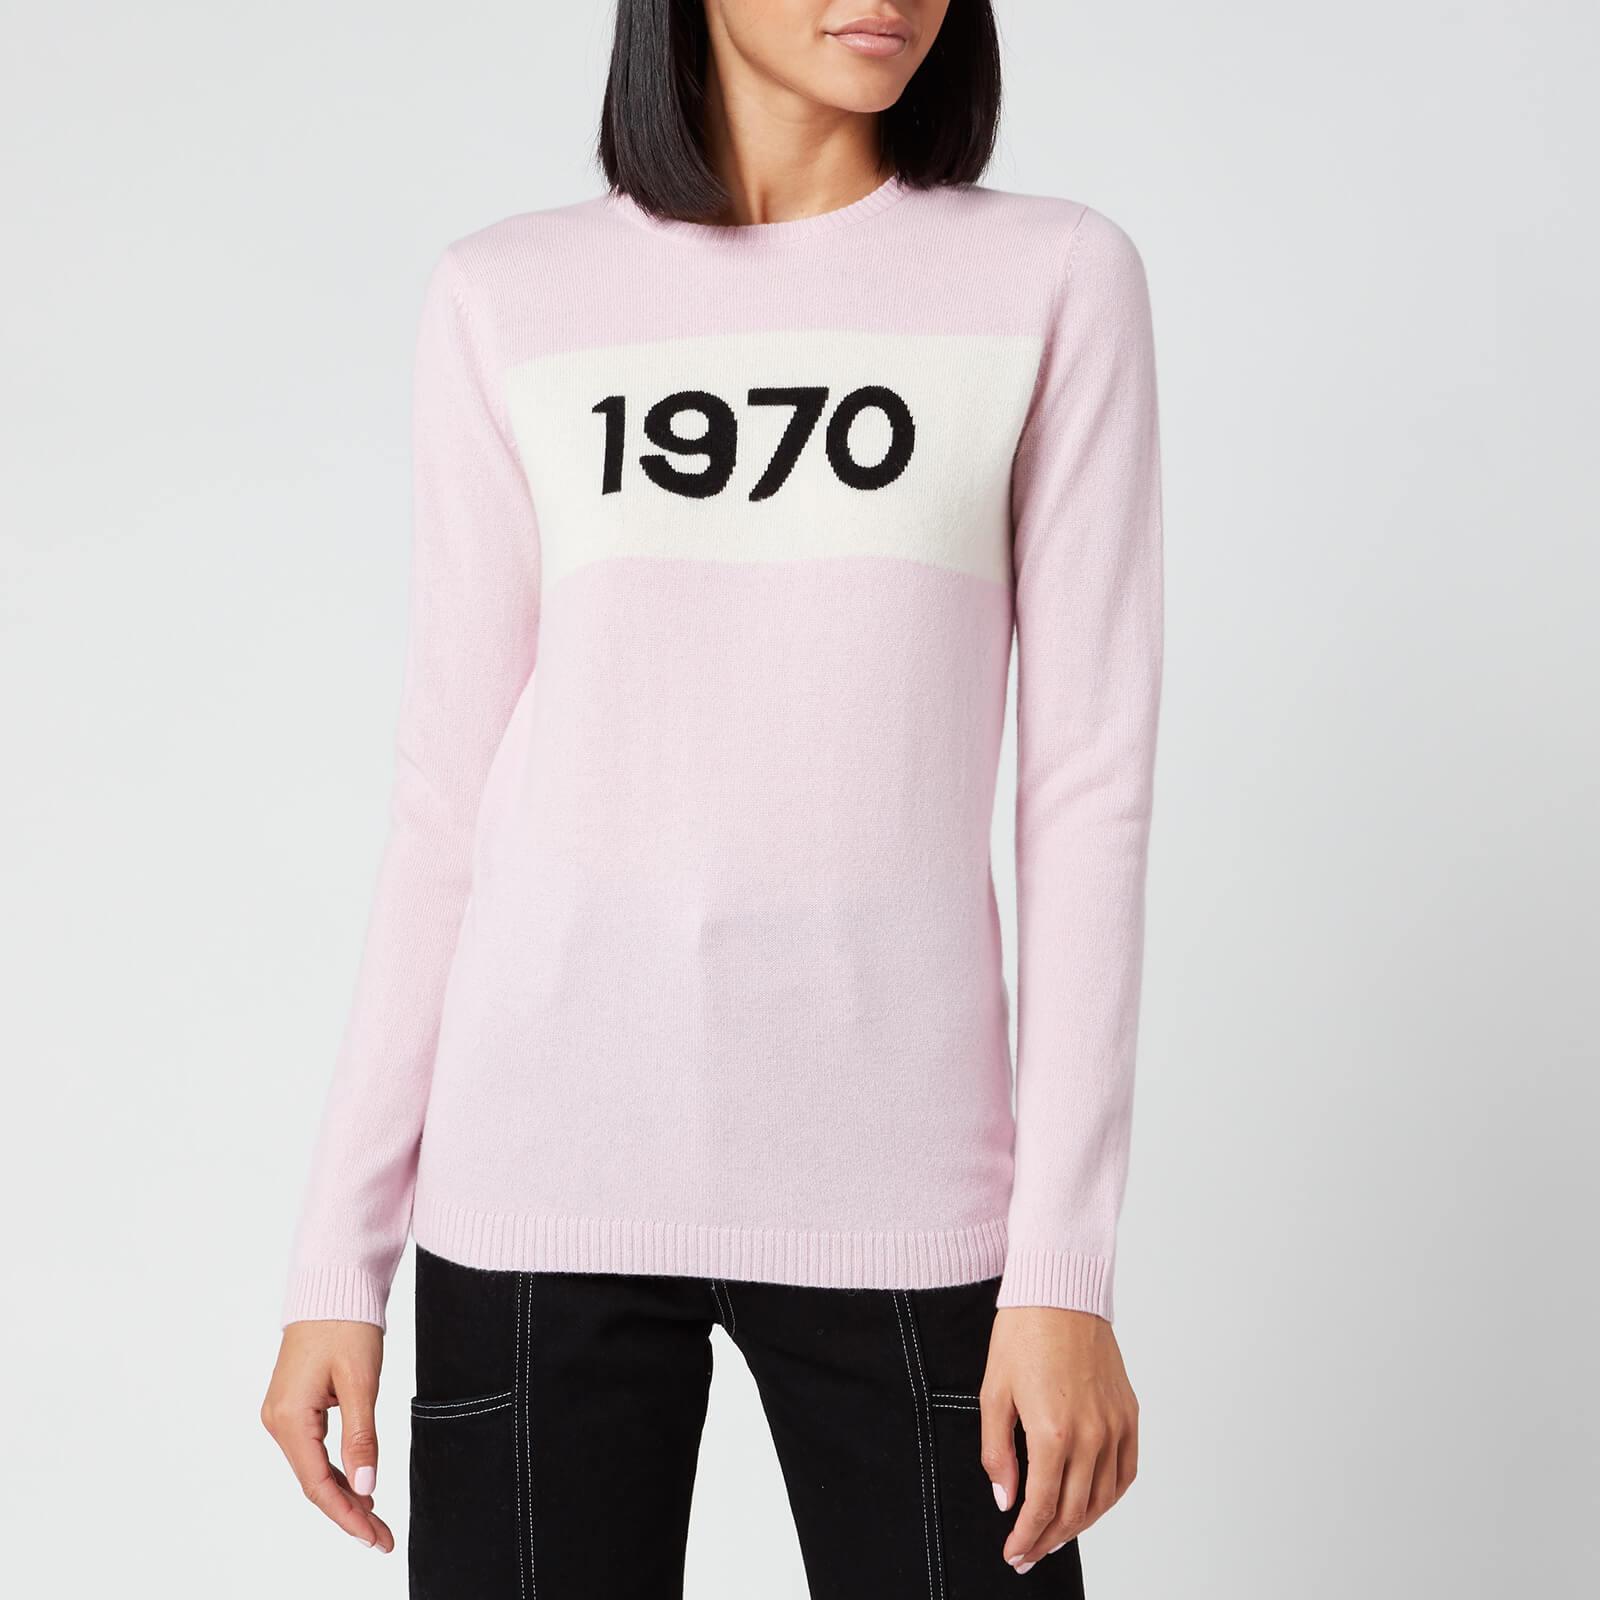 Bella Freud Women's 1970 Cashmere Jumper Pink